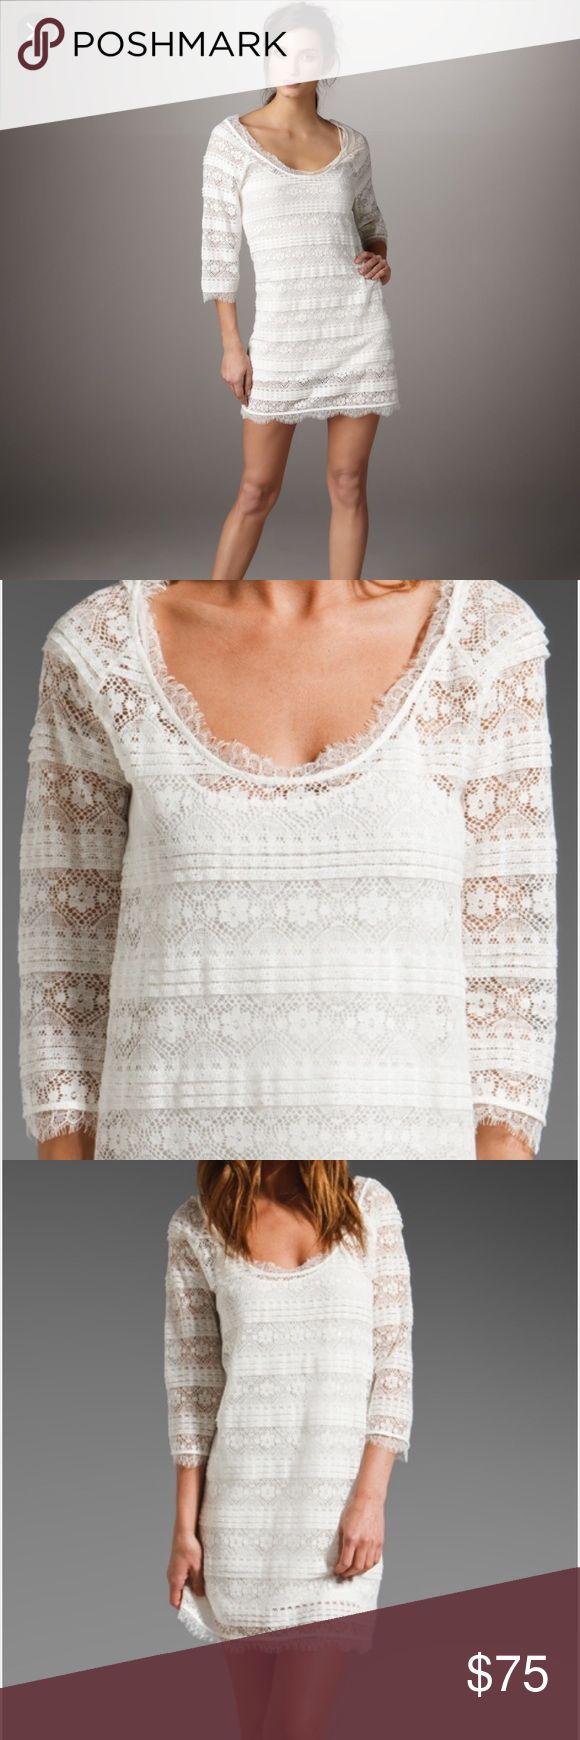 White apron brea - Joie Lace Brea Dress Joie Lace Brea Dress Worn Once For Photos Slip Is